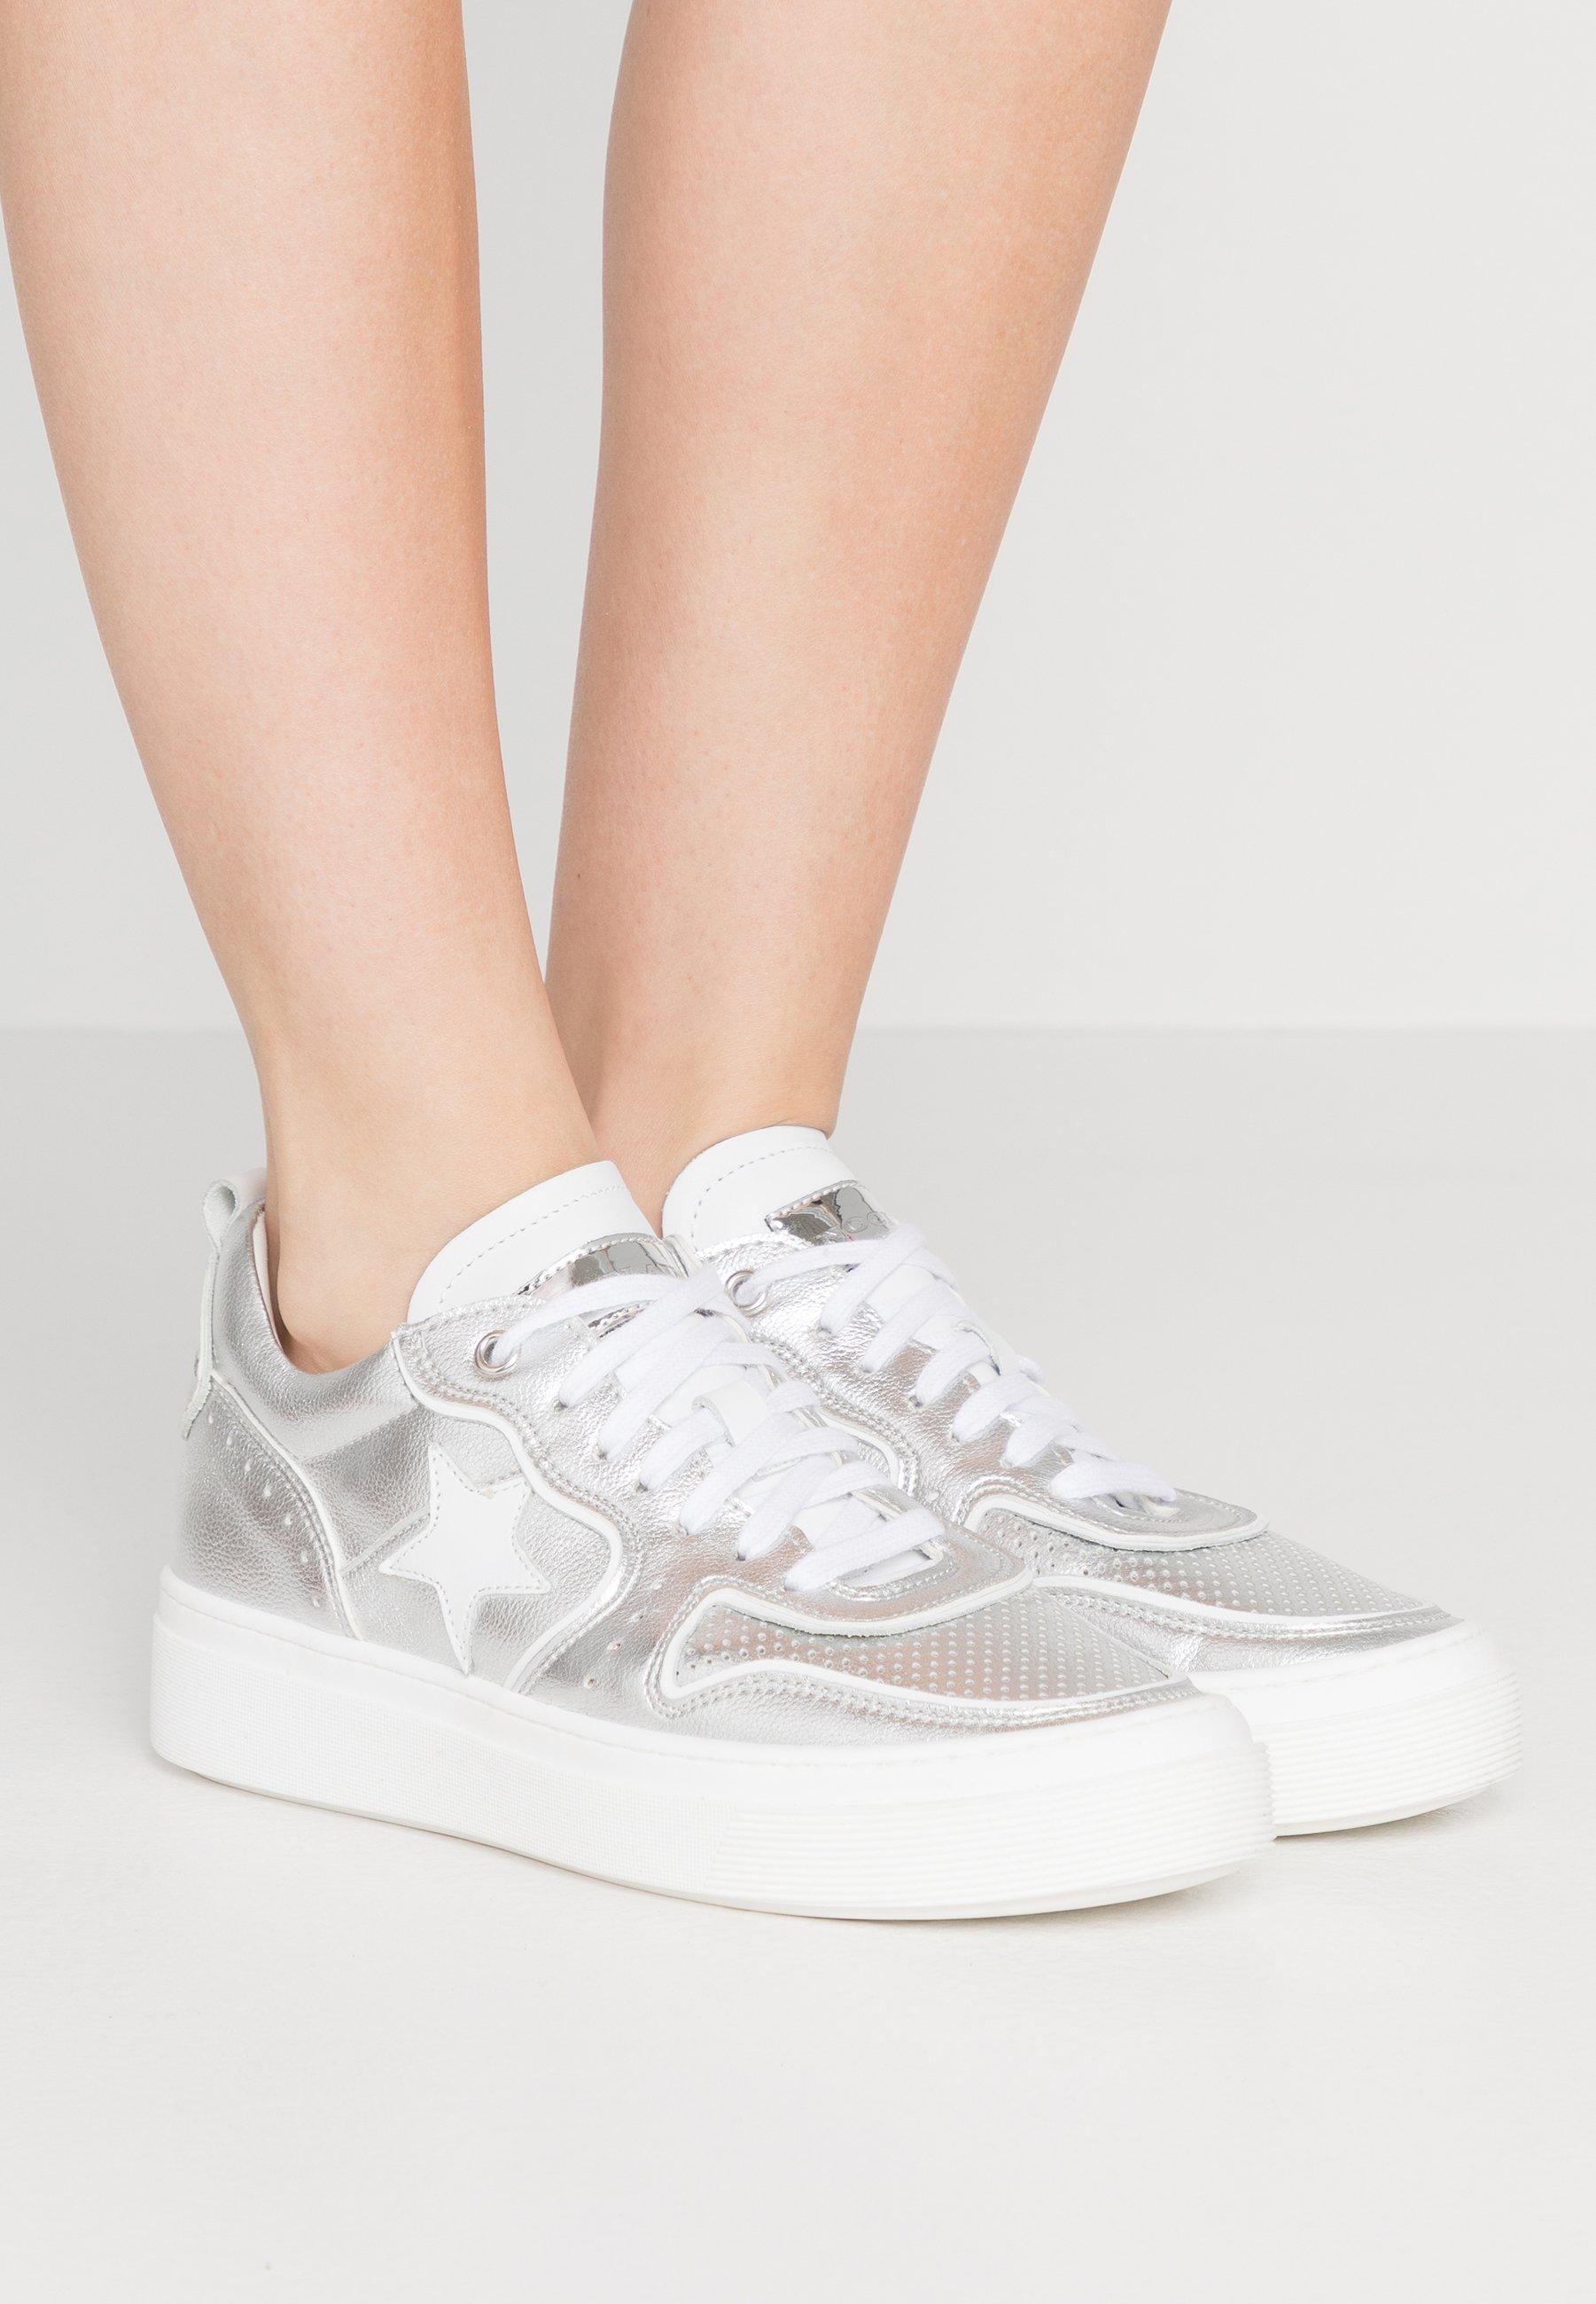 Noclaim ALEX  - Sneakers - argento